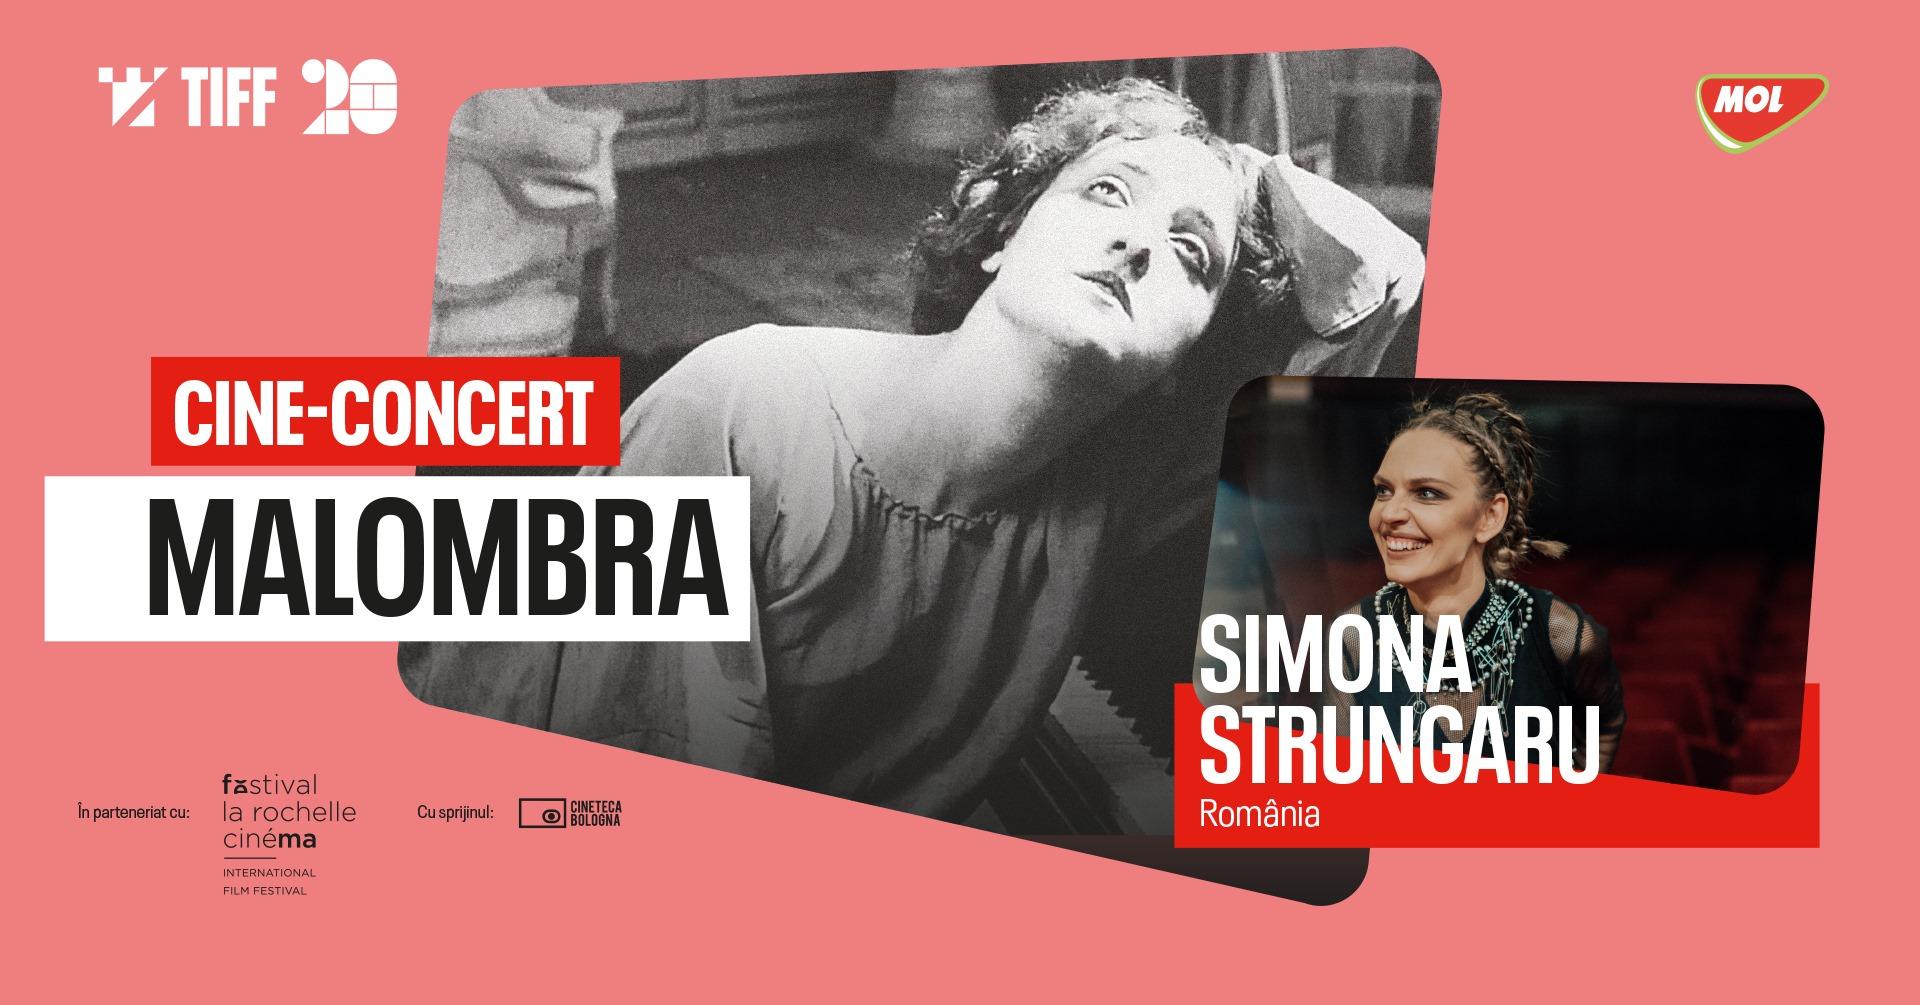 Cine-concert: Malombra by Simona Strungaru | TIFF 2021